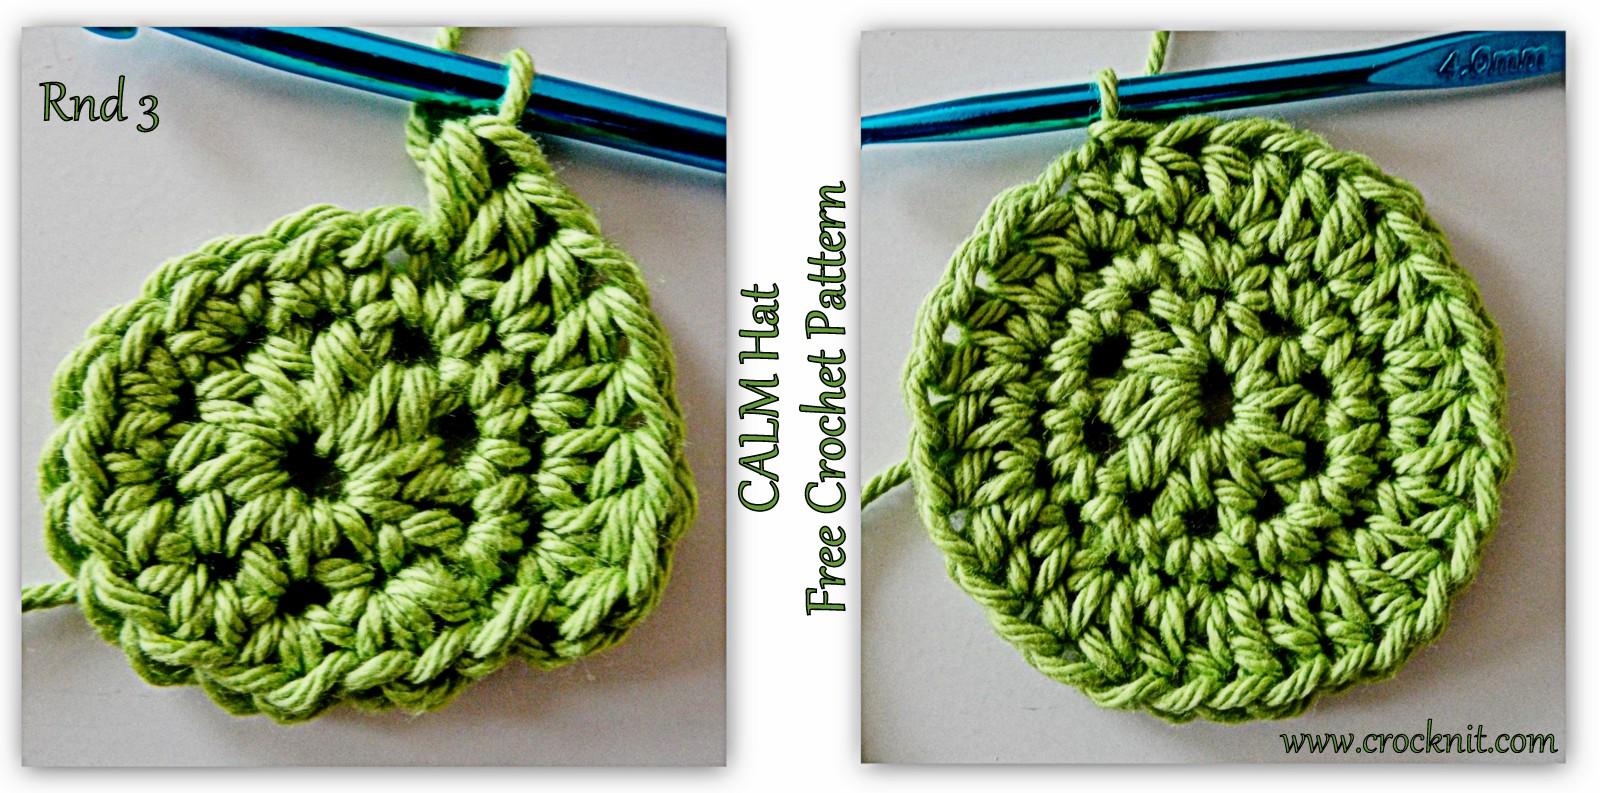 MICROCKNIT CREATIONS: SLEEP Hats Free Crochet Pattern #4 CALM HAT